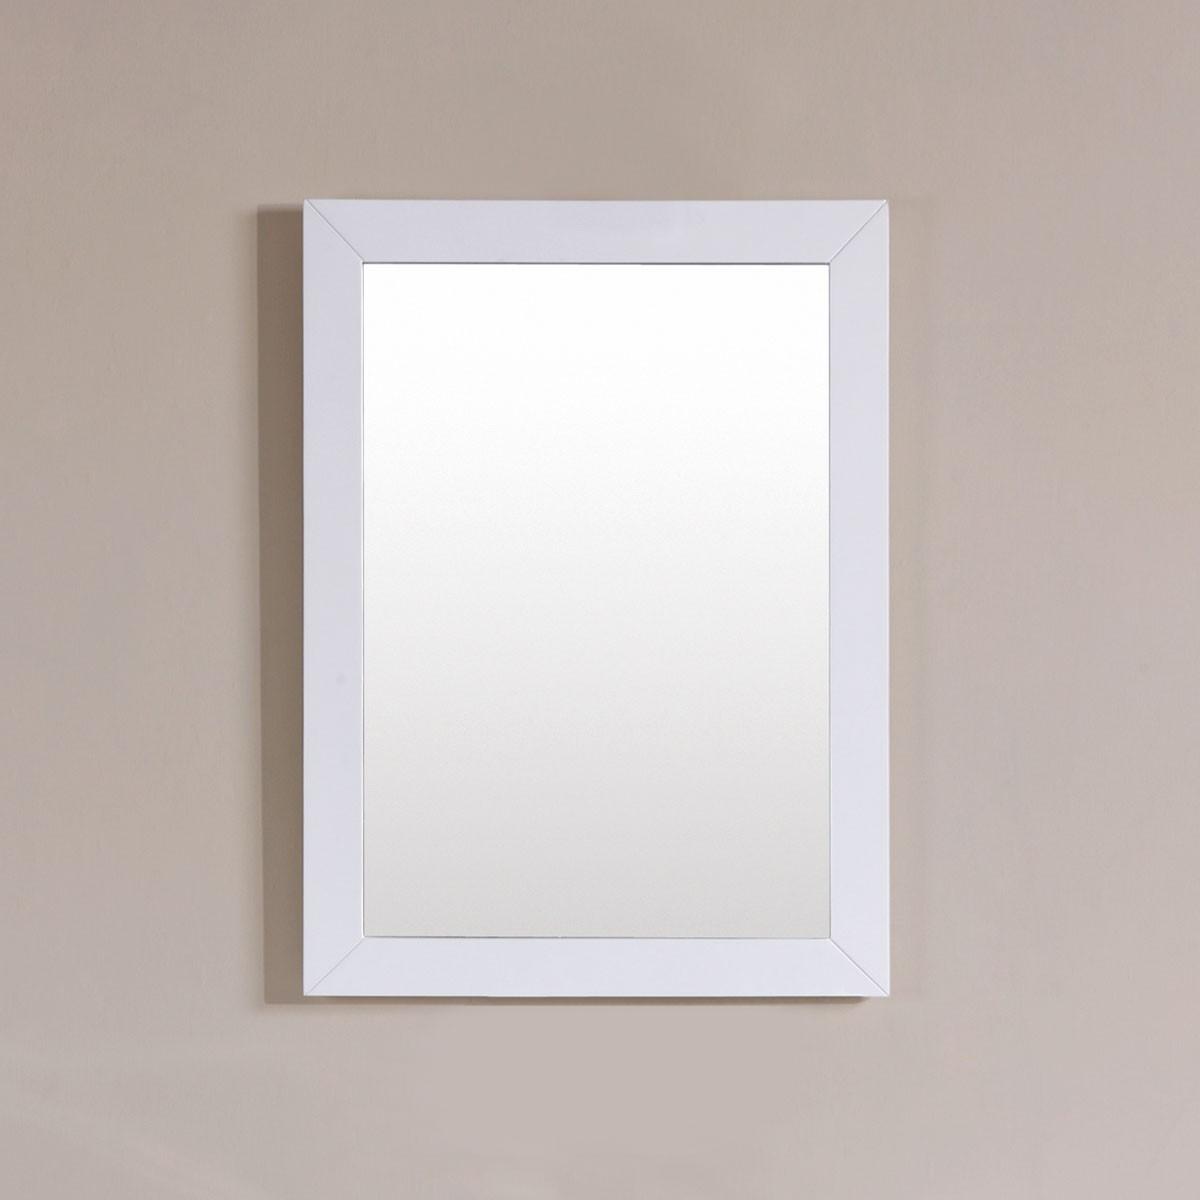 24 x 31 po Miroir avec cadre blanc (DK-T9312-24WM)